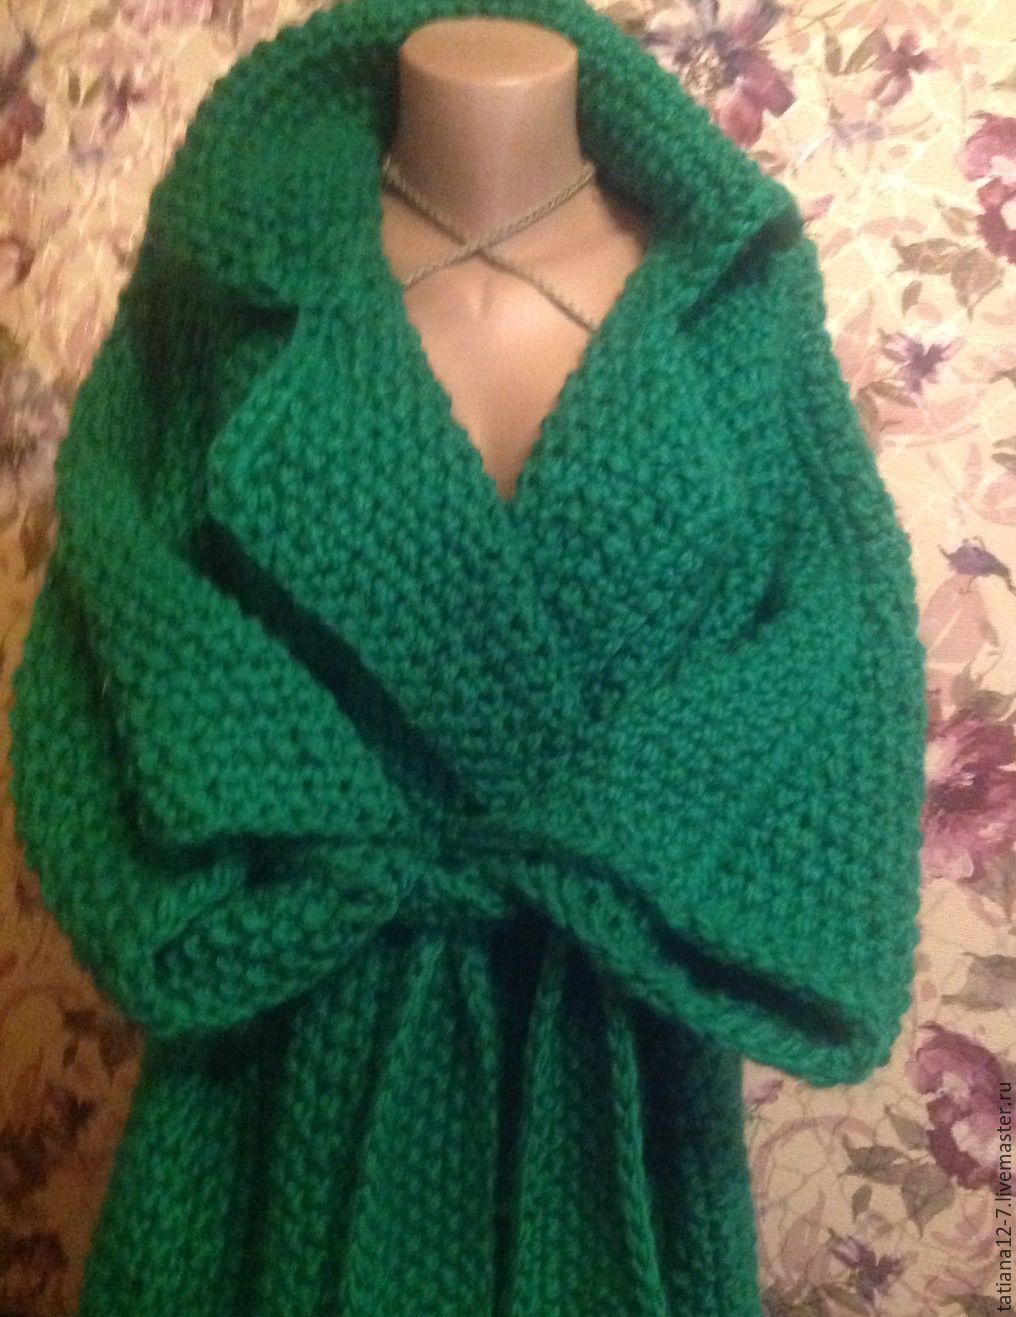 'Esmeralda' exclusive coat handmade, Coats, Moscow,  Фото №1